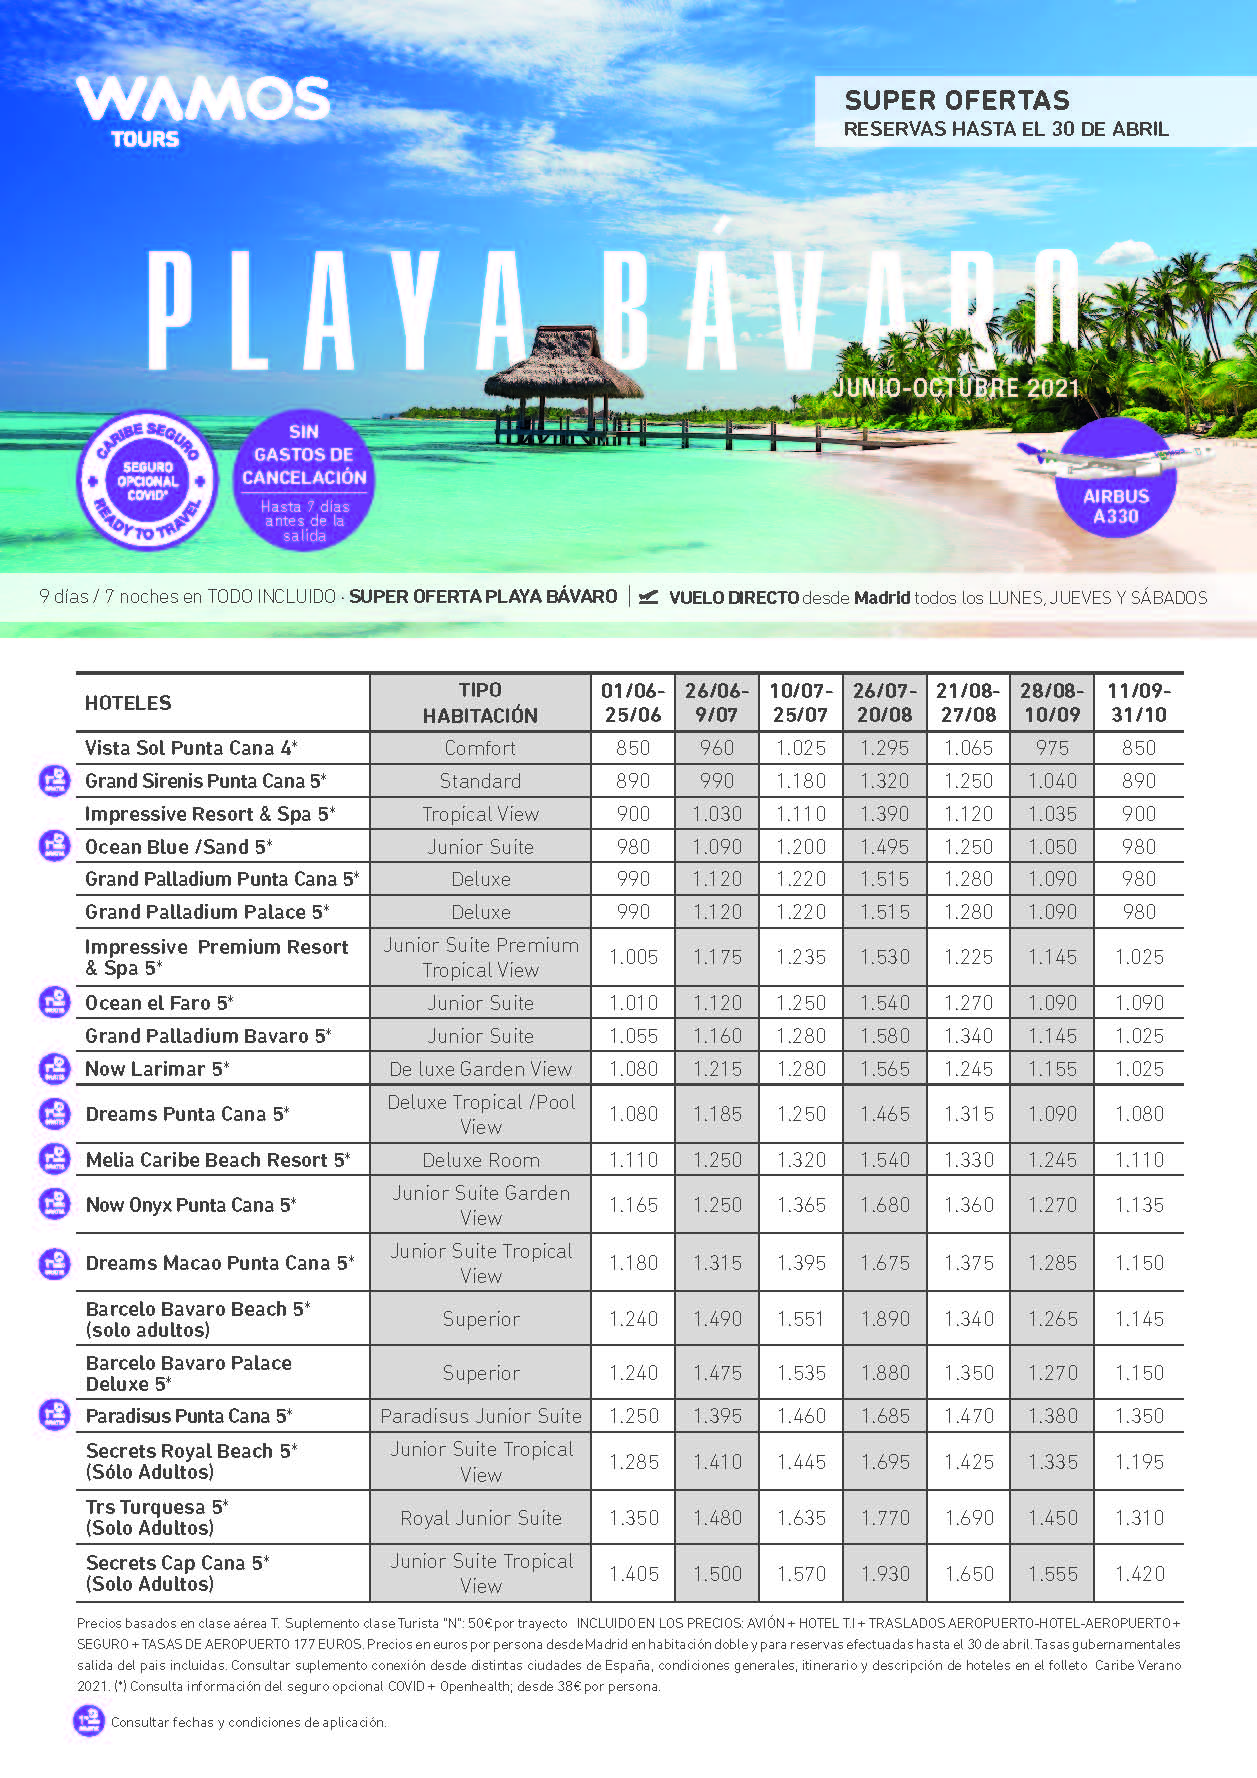 Super Ofertas Wamos Tours Playa Bavaro Verano 2021 reservas hasta 30 de abril